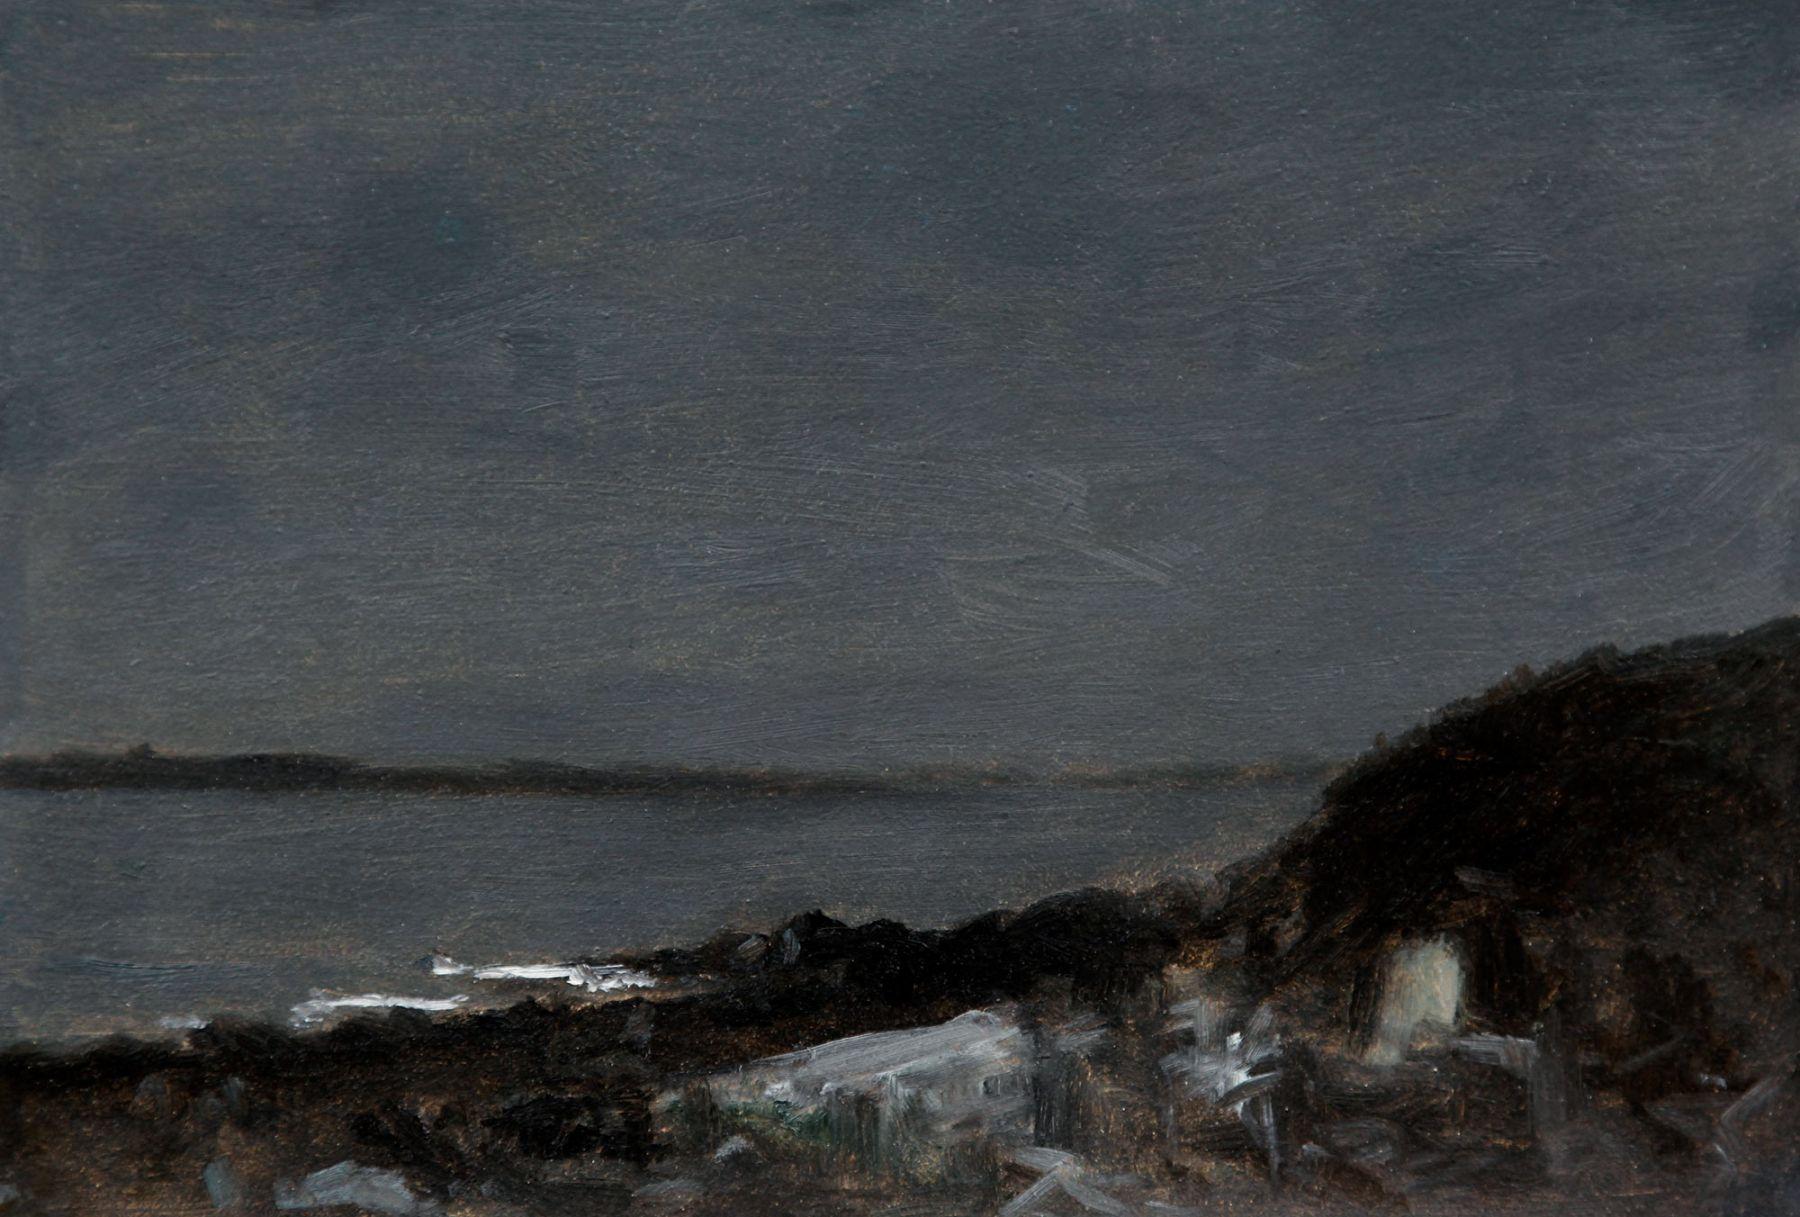 LOCKWOOD DE FOREST (1850-1932), Moonlight on the Shore, 1901